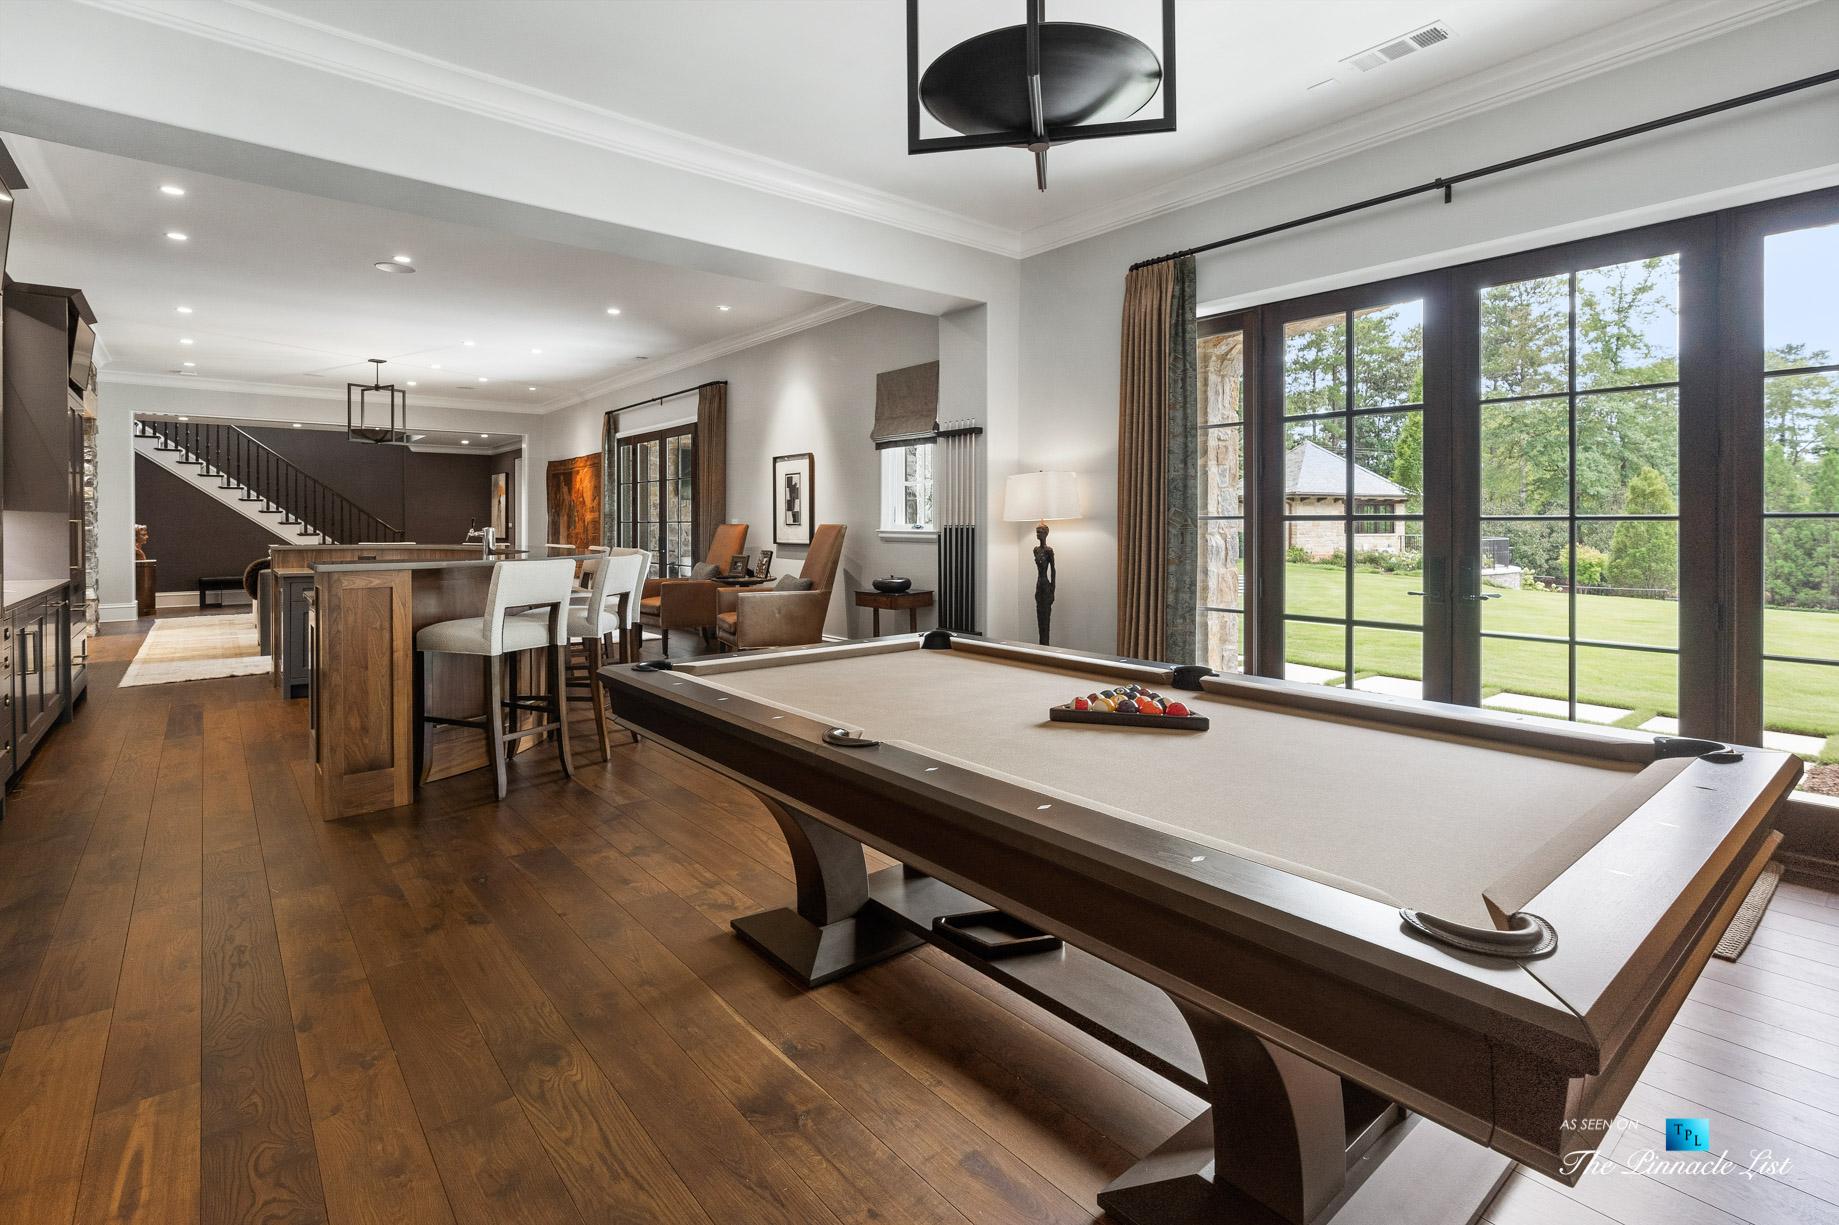 1150 W Garmon Rd, Atlanta, GA, USA – Recreation Room Pool Table – Luxury Real Estate – Buckhead Estate Home